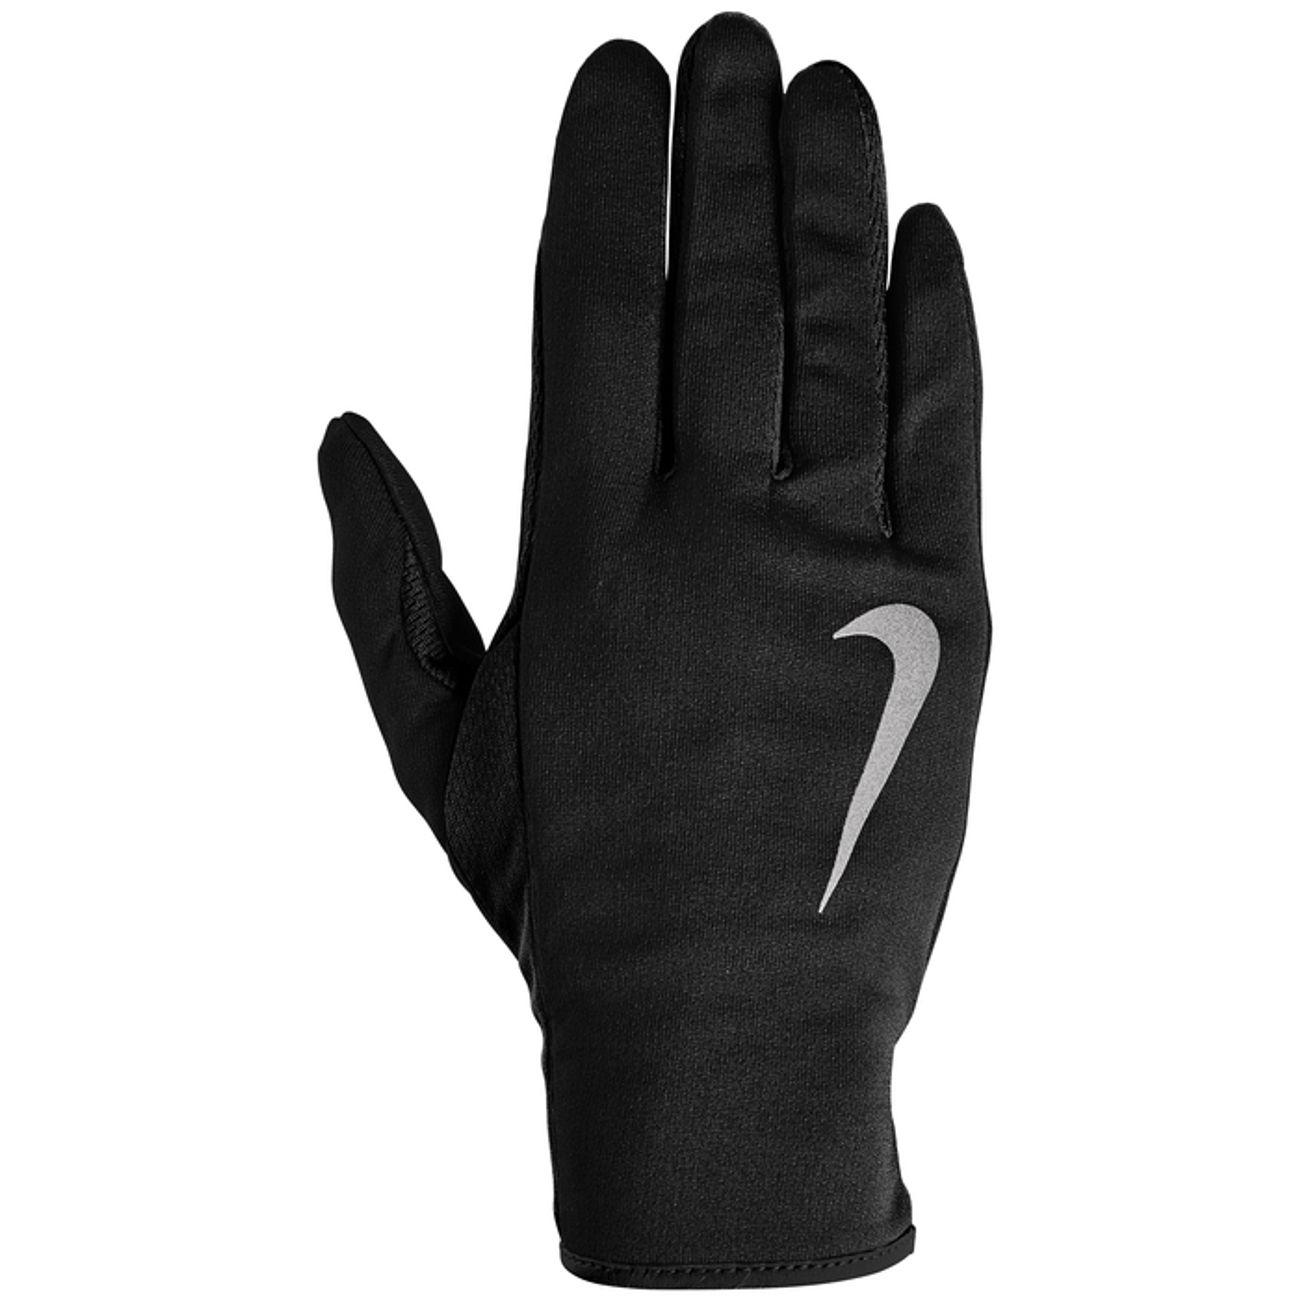 hat and glove set achat et prix pas cher go sport. Black Bedroom Furniture Sets. Home Design Ideas